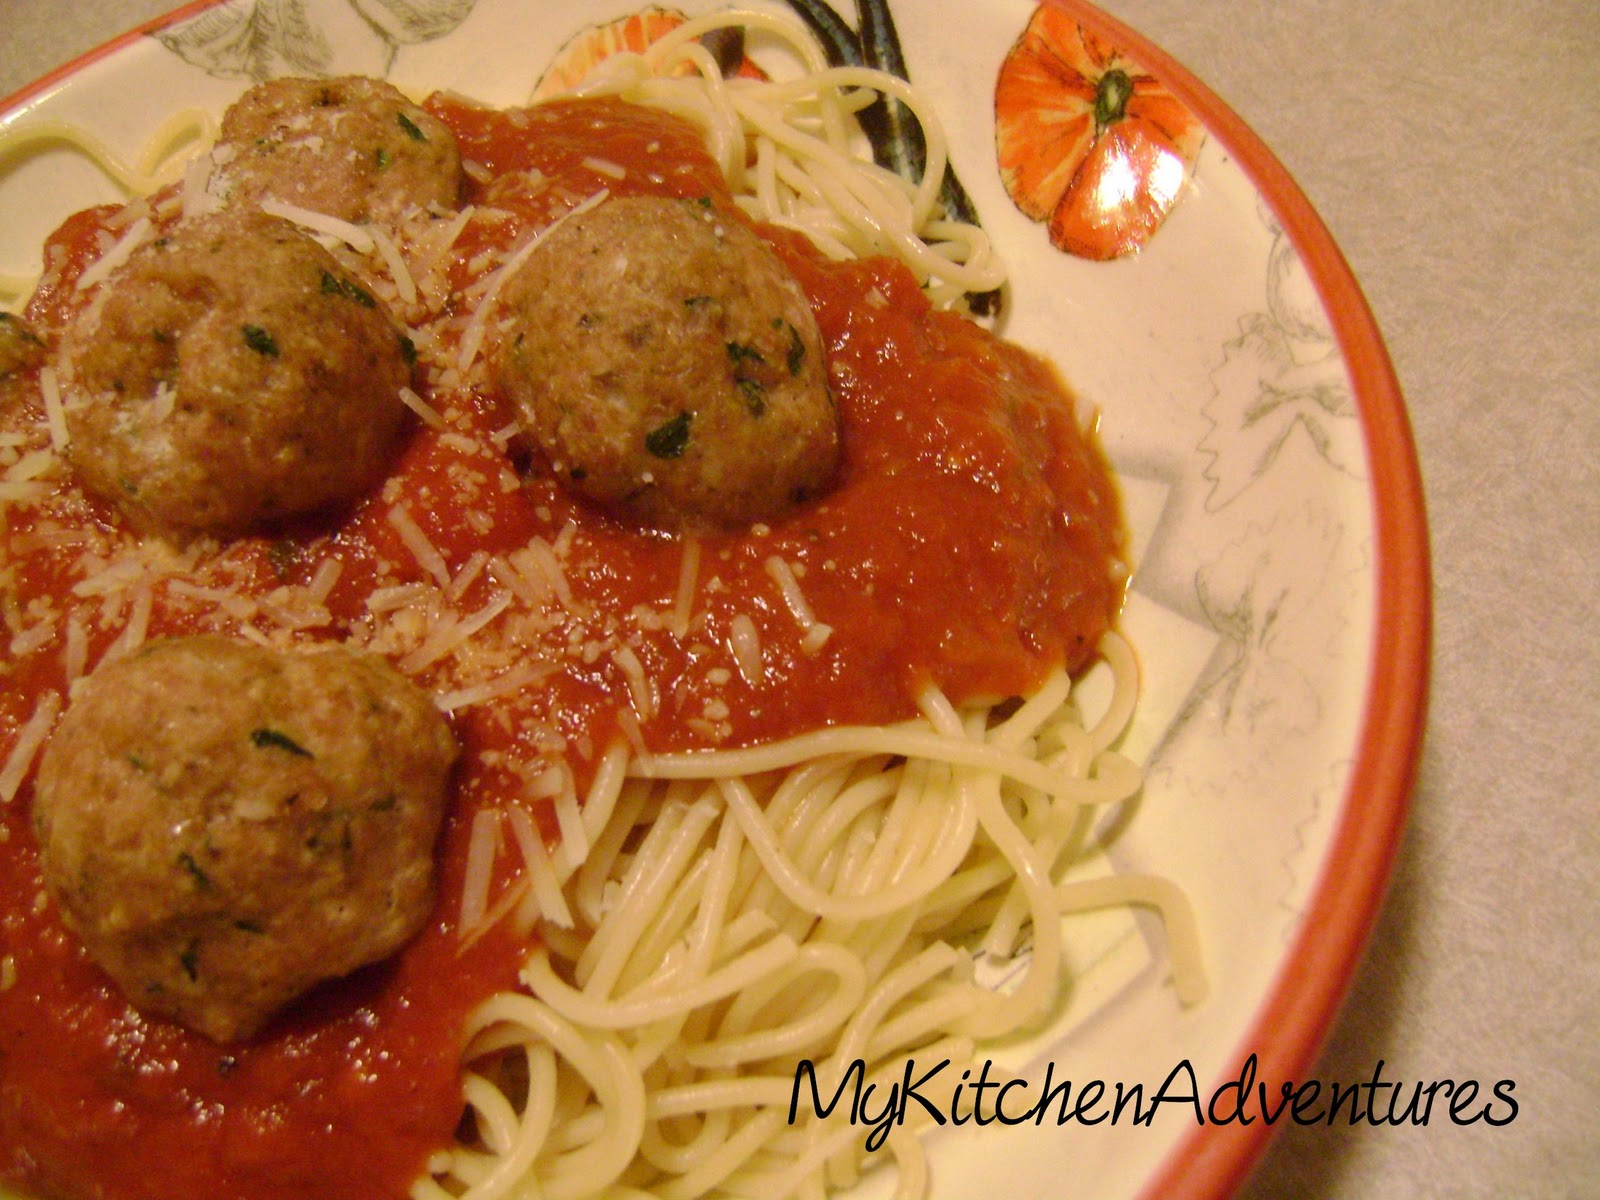 mka+italian+style+turkey+meatballs+and+spaghetti.JPG